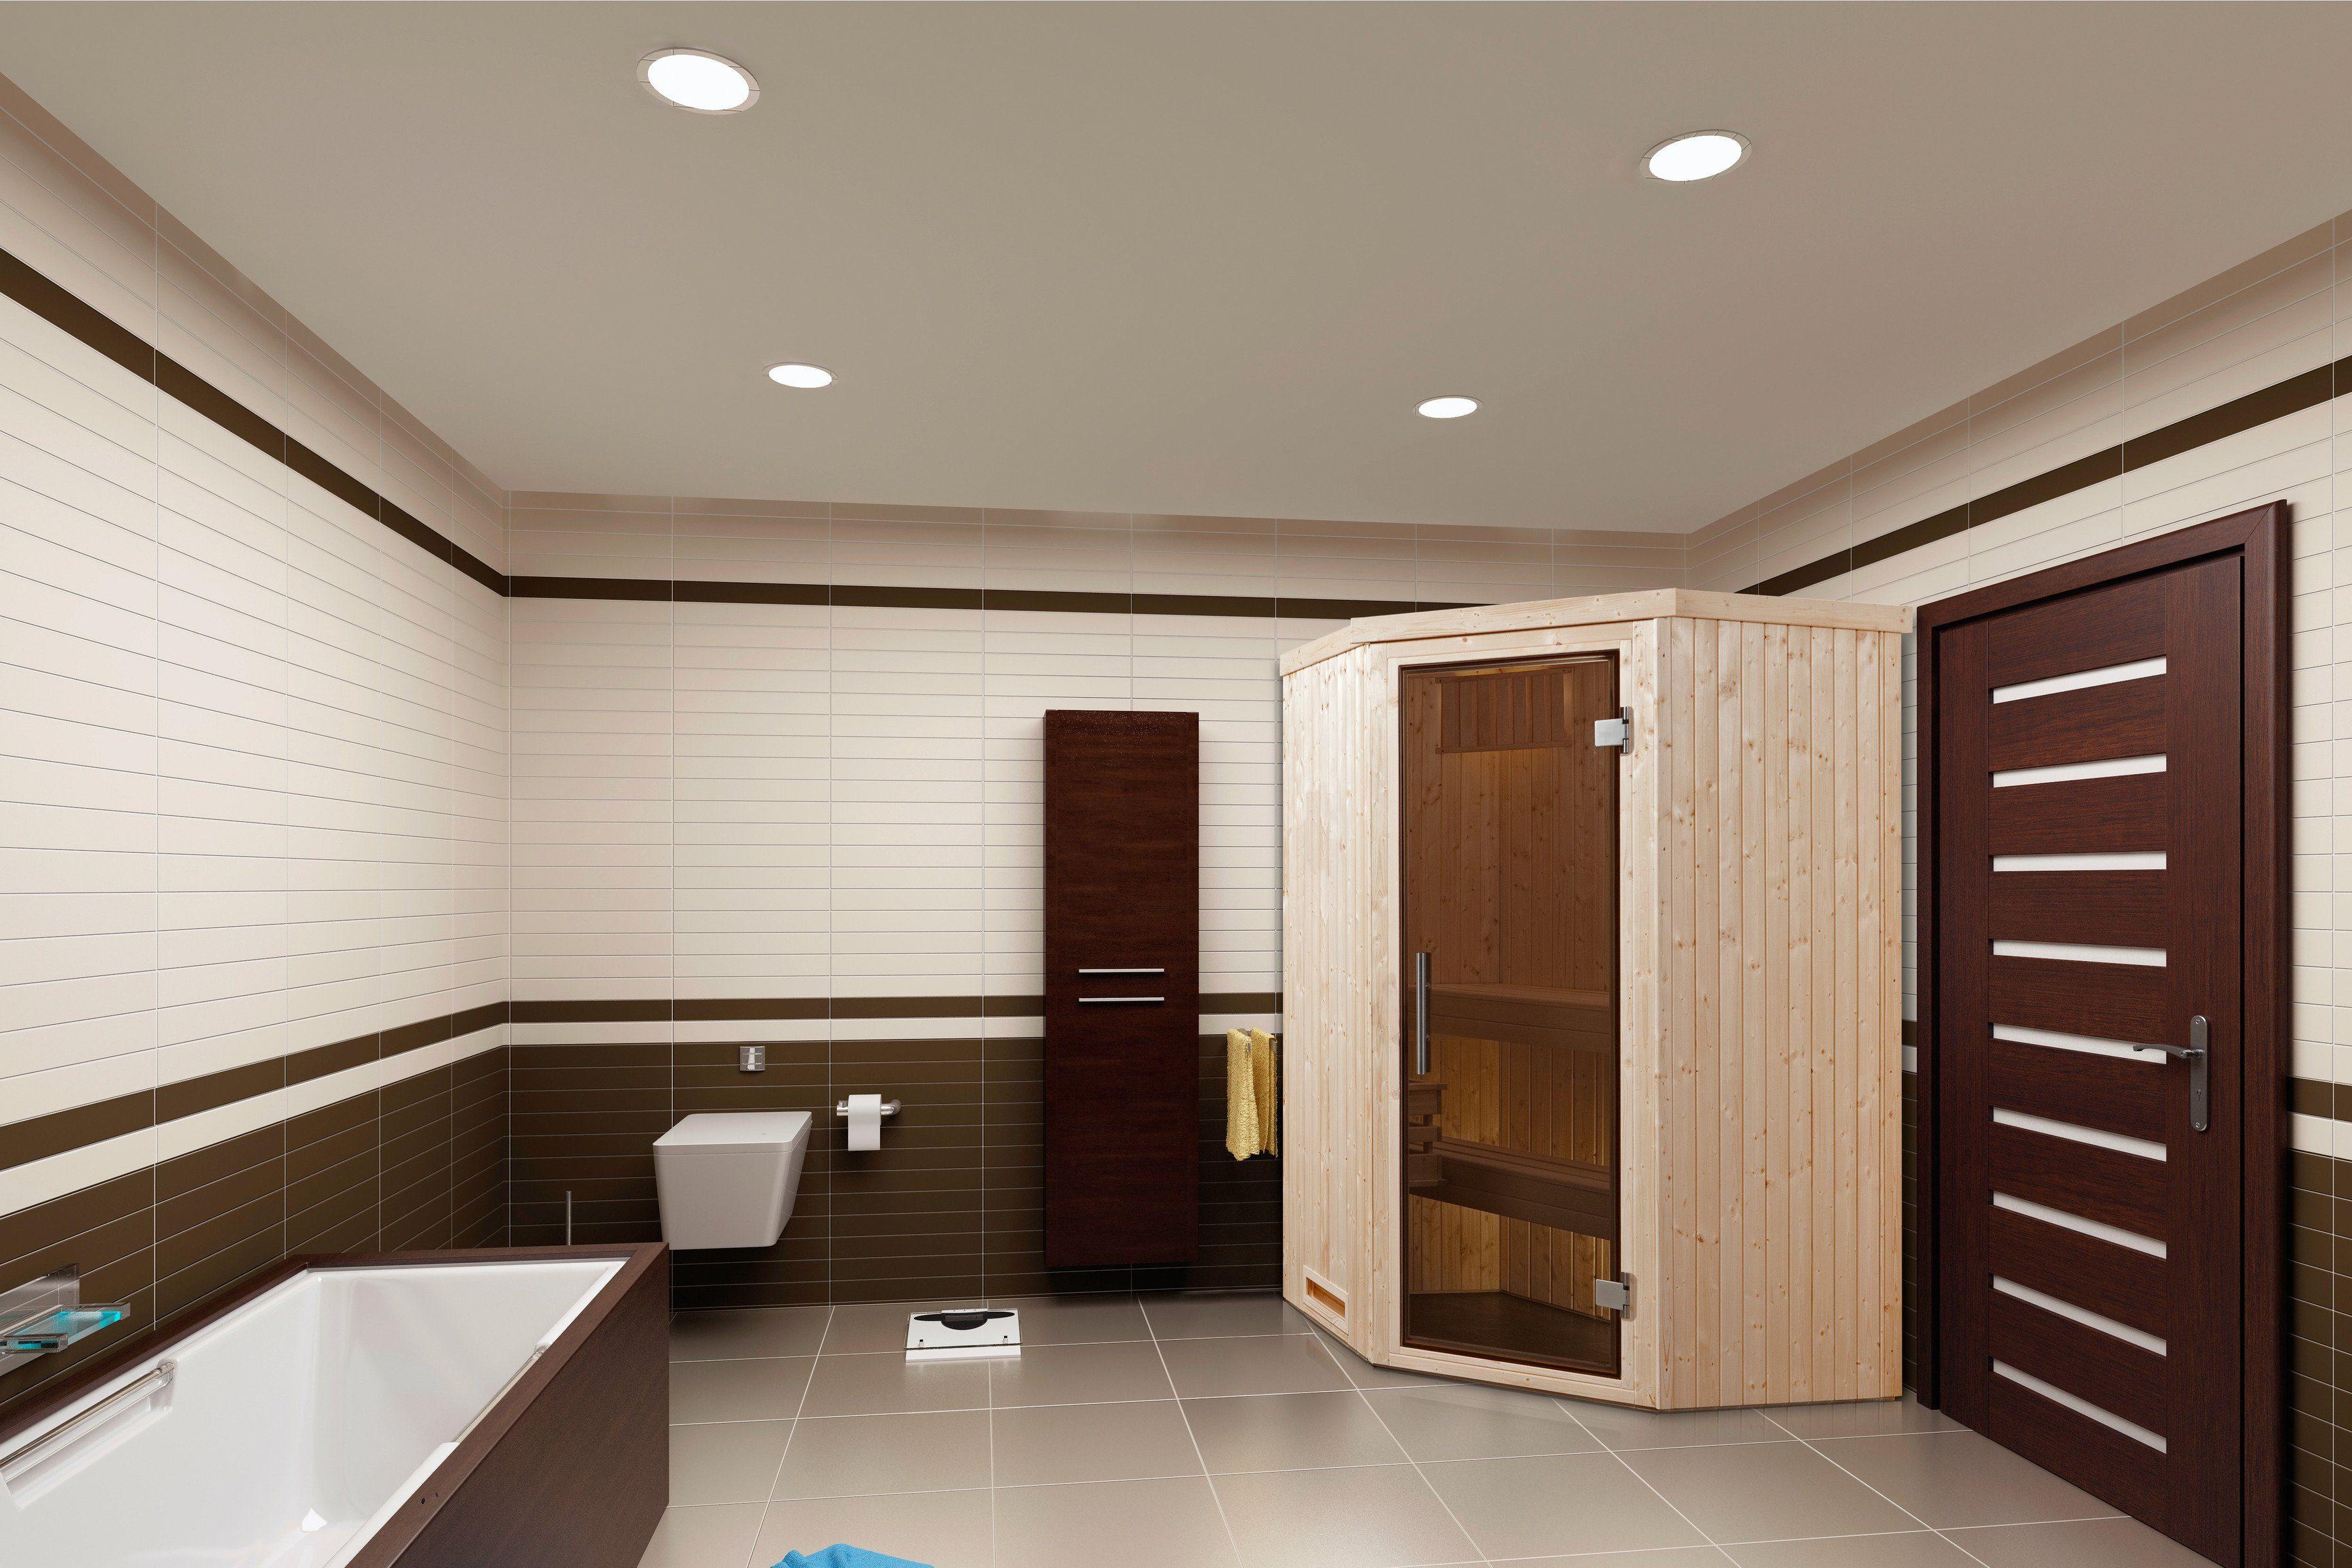 Weka Sauna »Lyngdal 1 Trend Kompakt«, 141/141/199 cm, 68 mm, 3,6-KW-Ofen